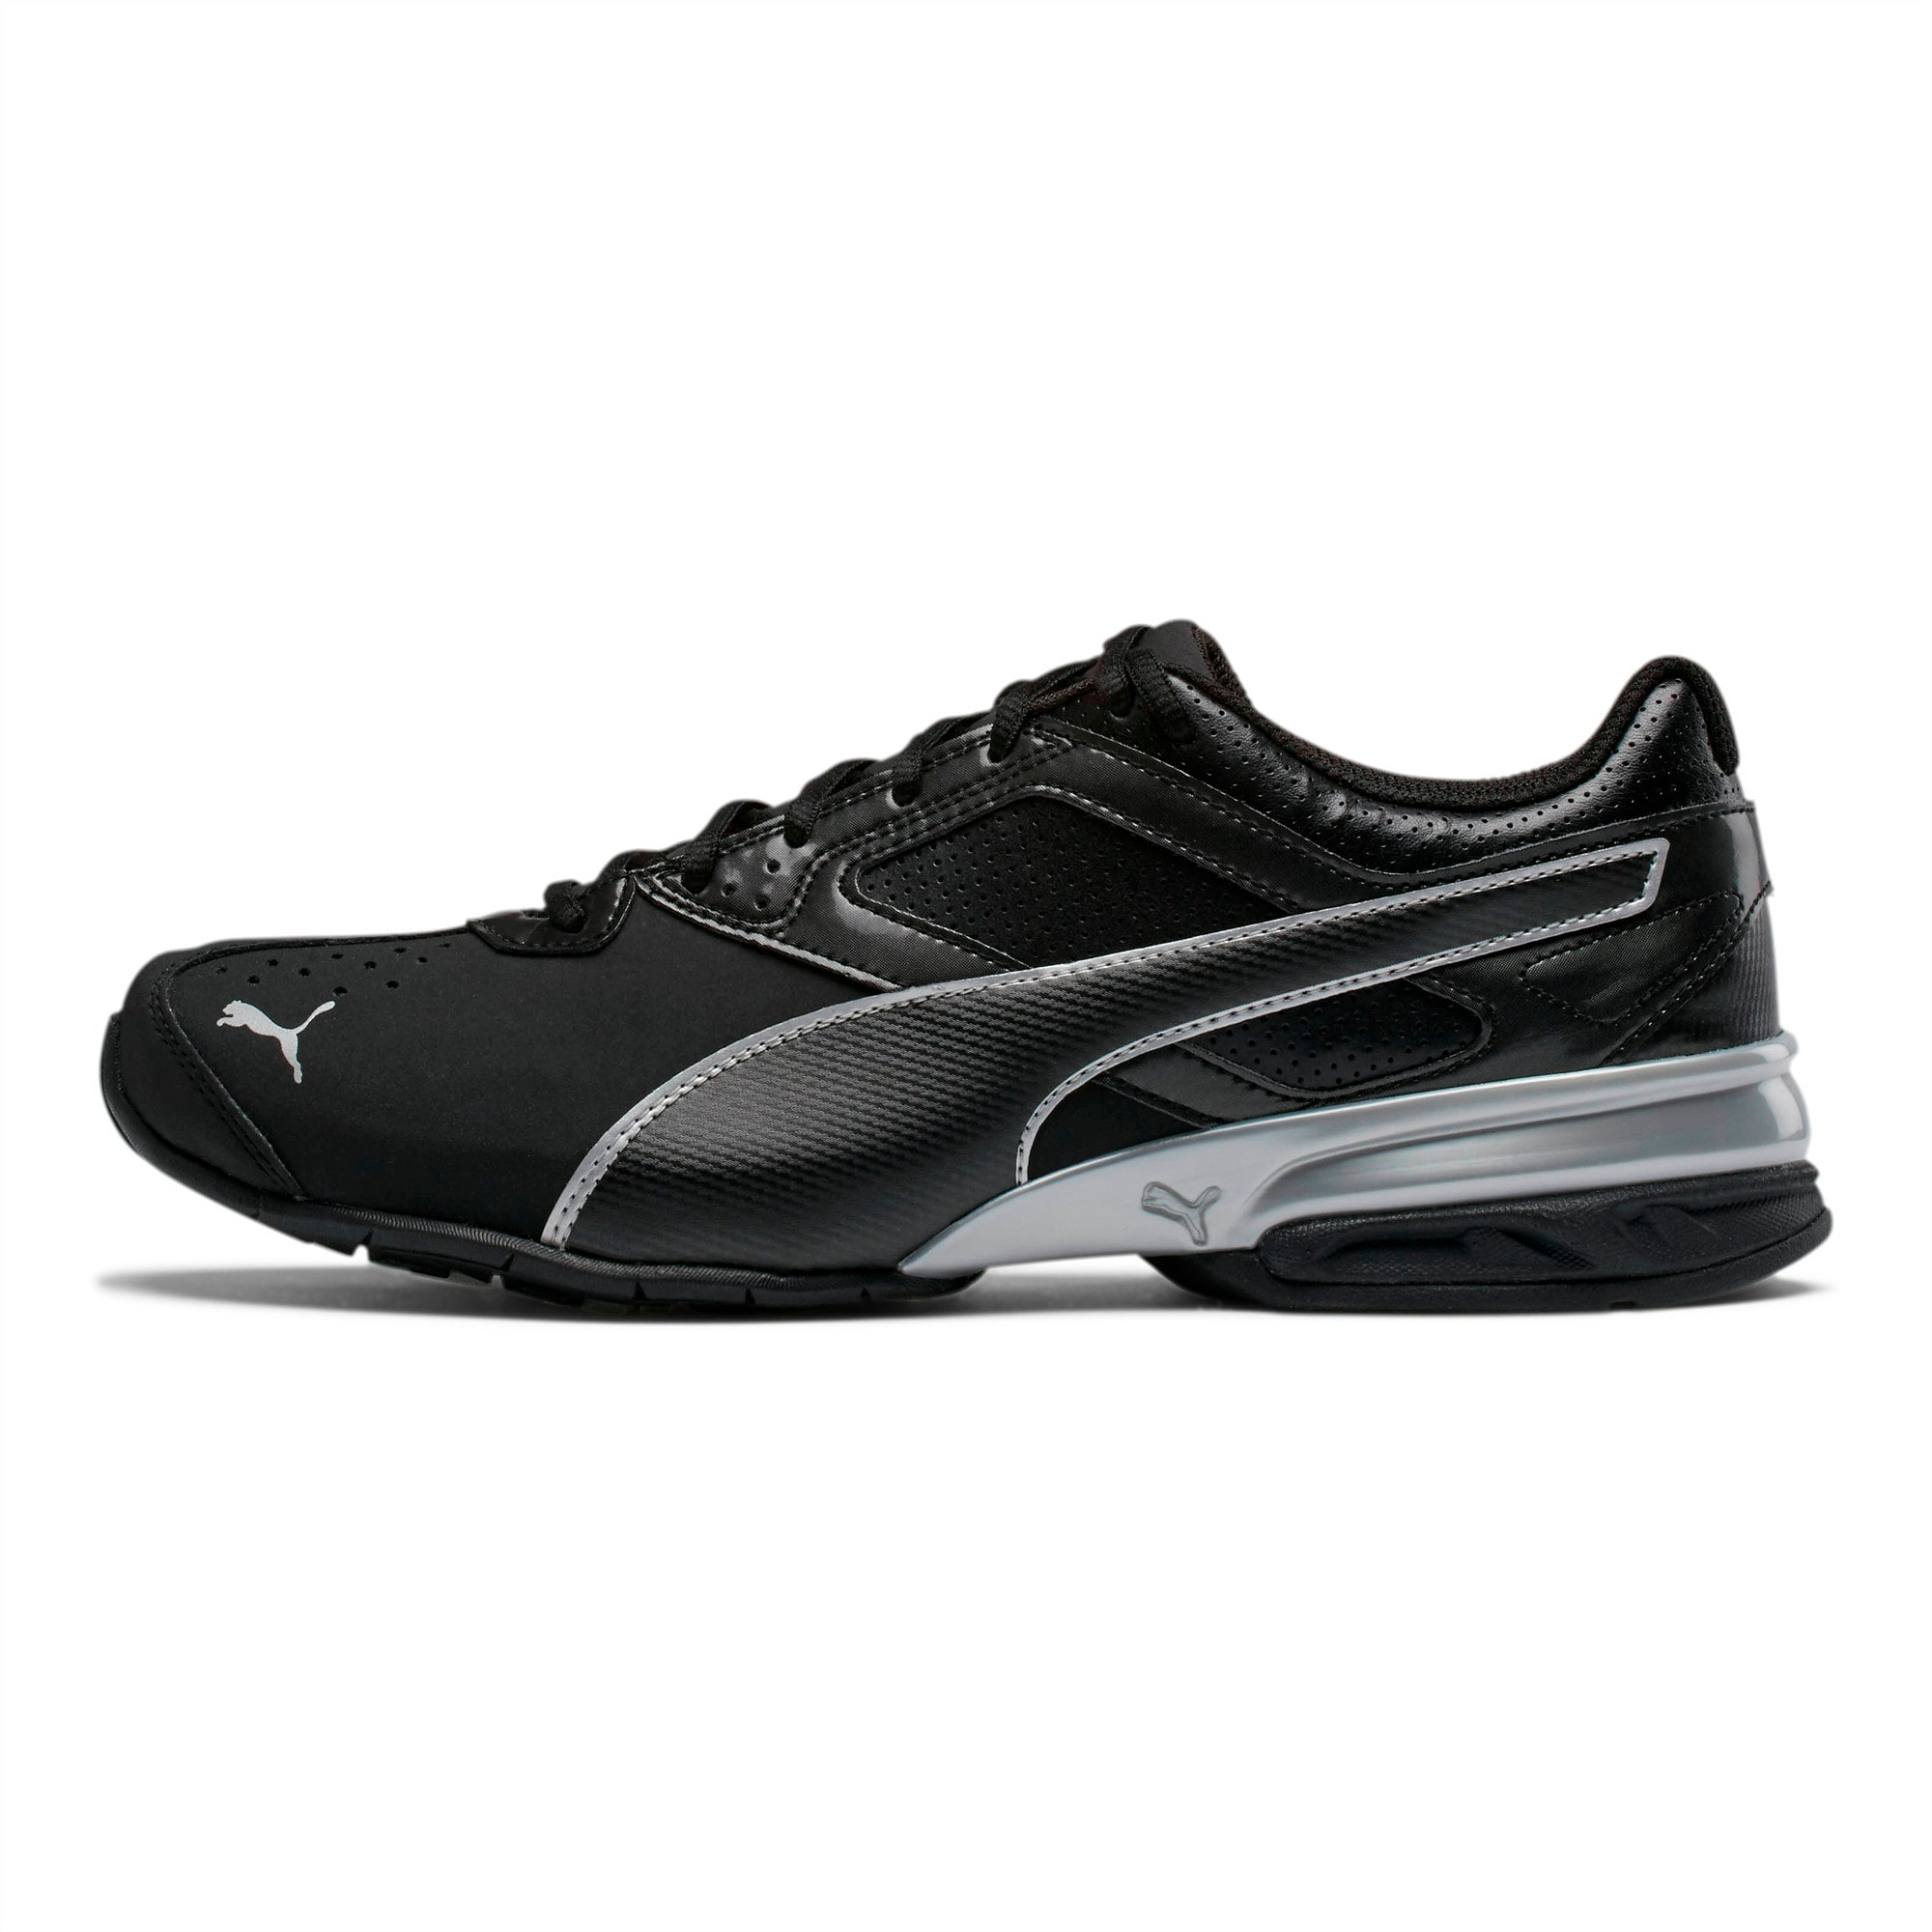 Tazon 6 FM Men's Running Shoes